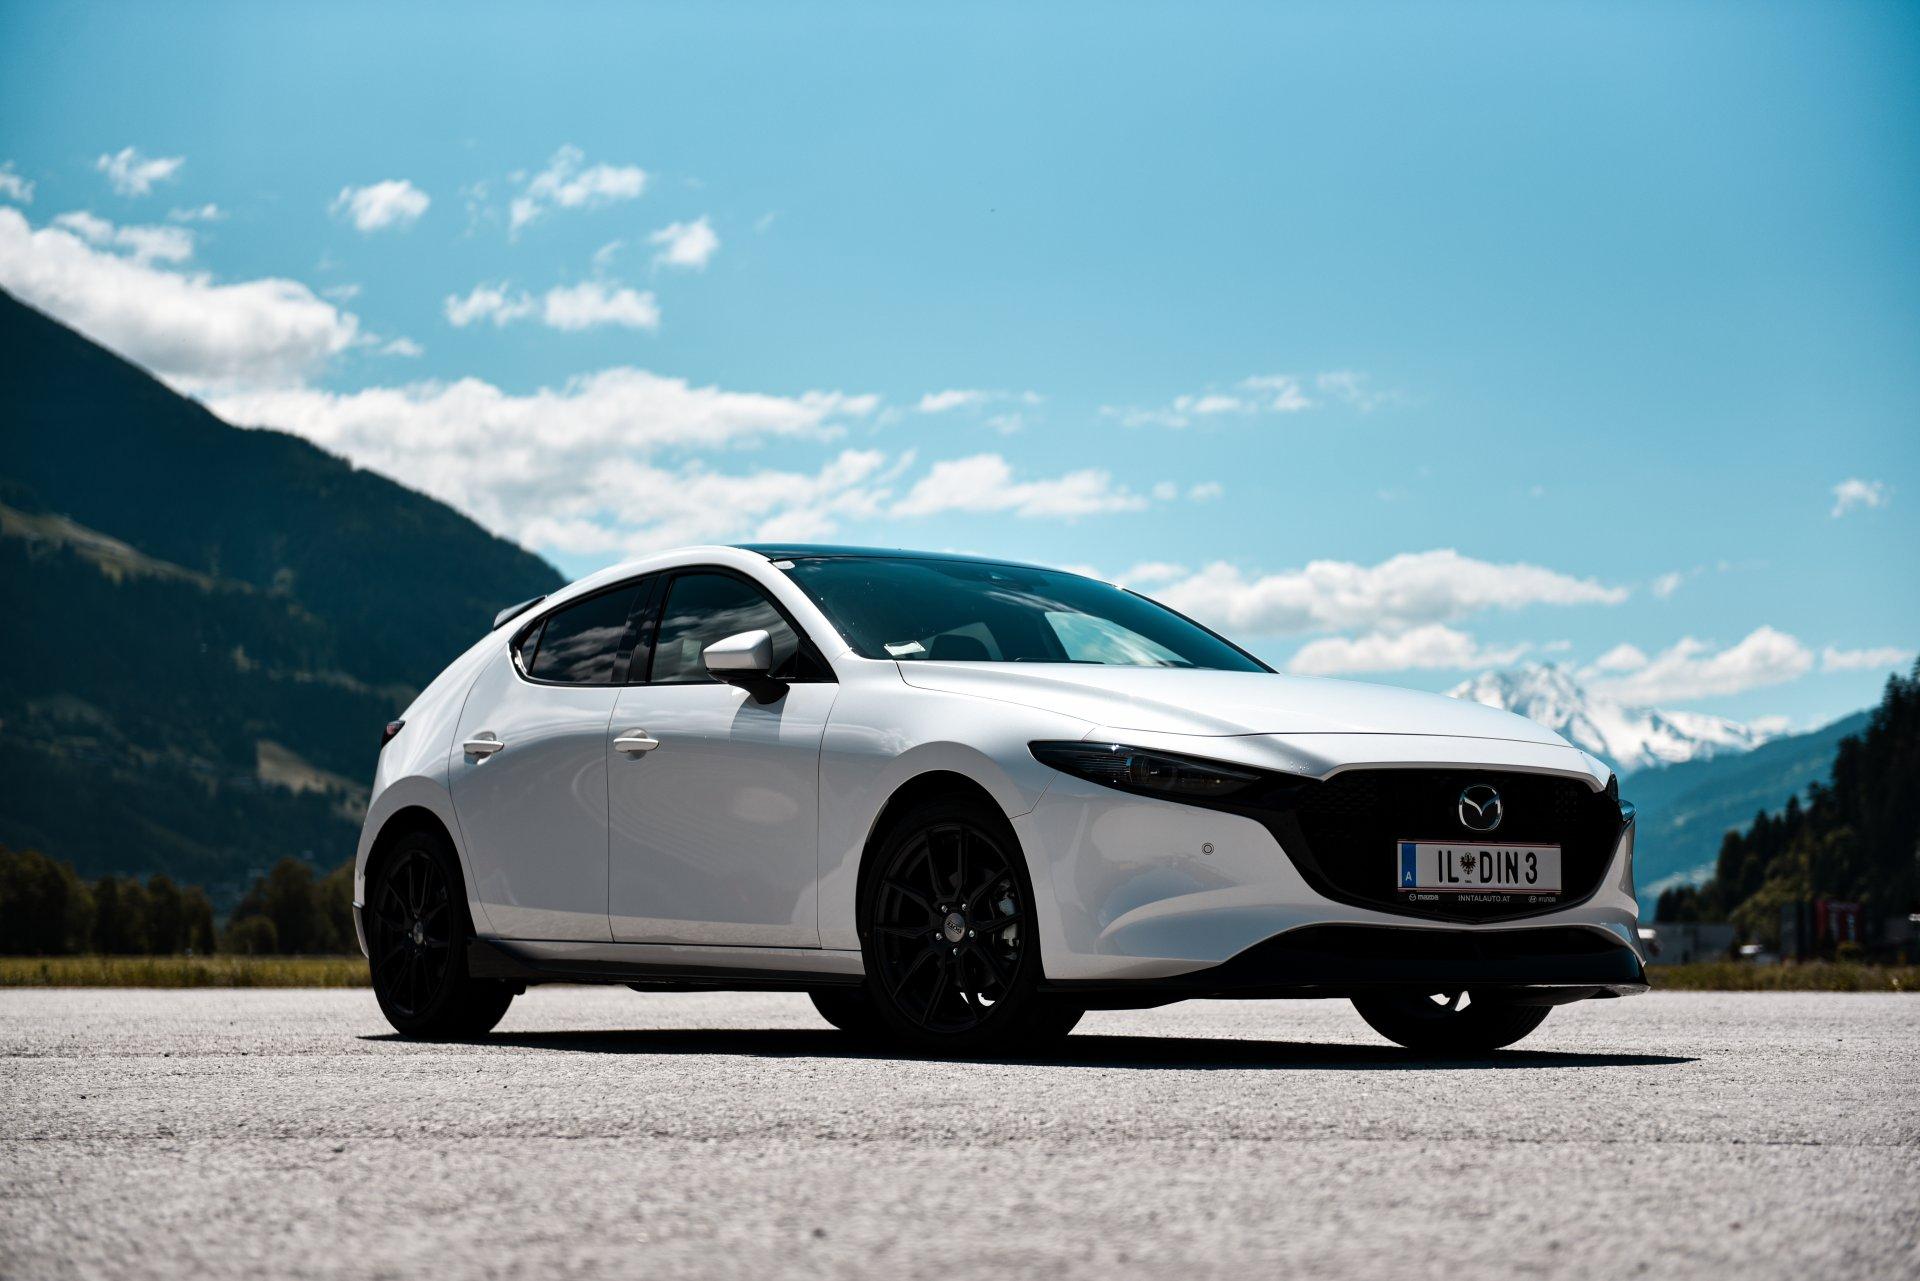 2020_06_Mazda_Shooting-2.JPG